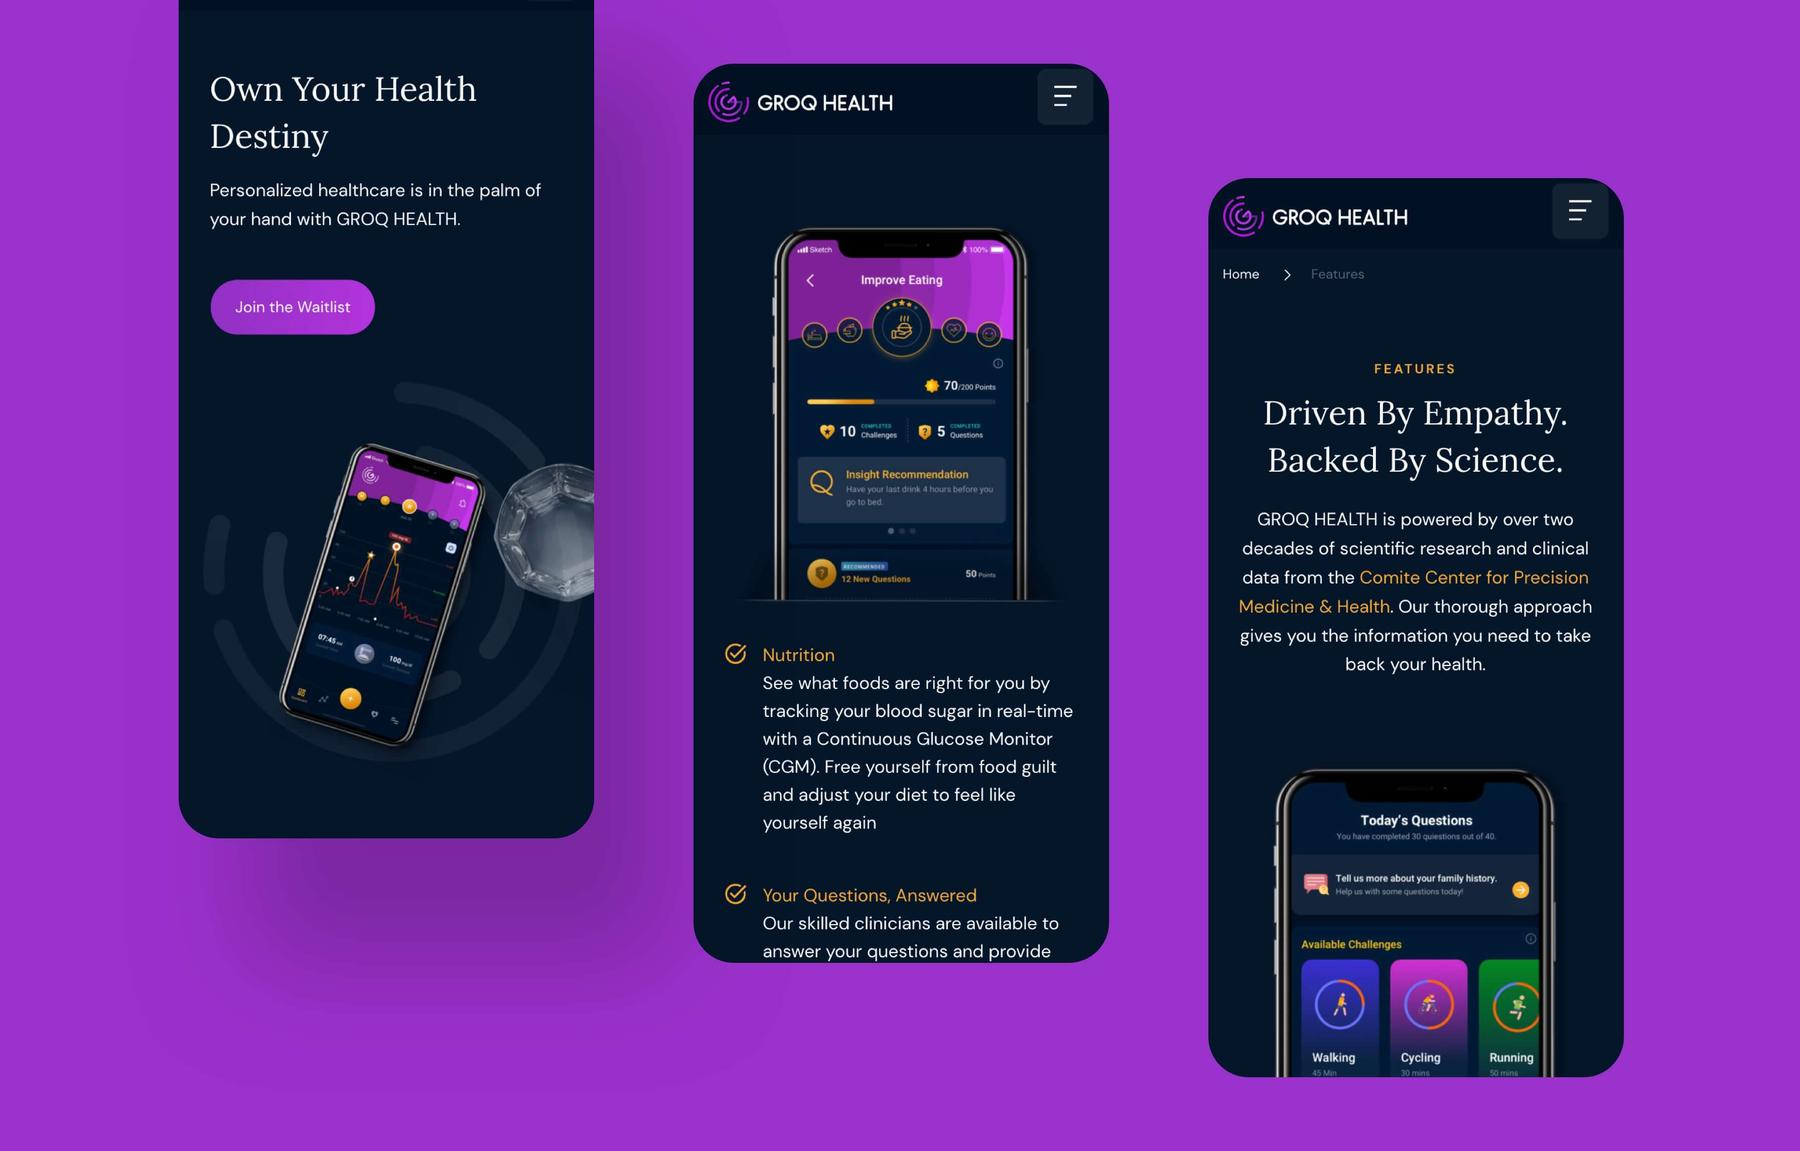 MWB create a new website for GROQ HEALTH